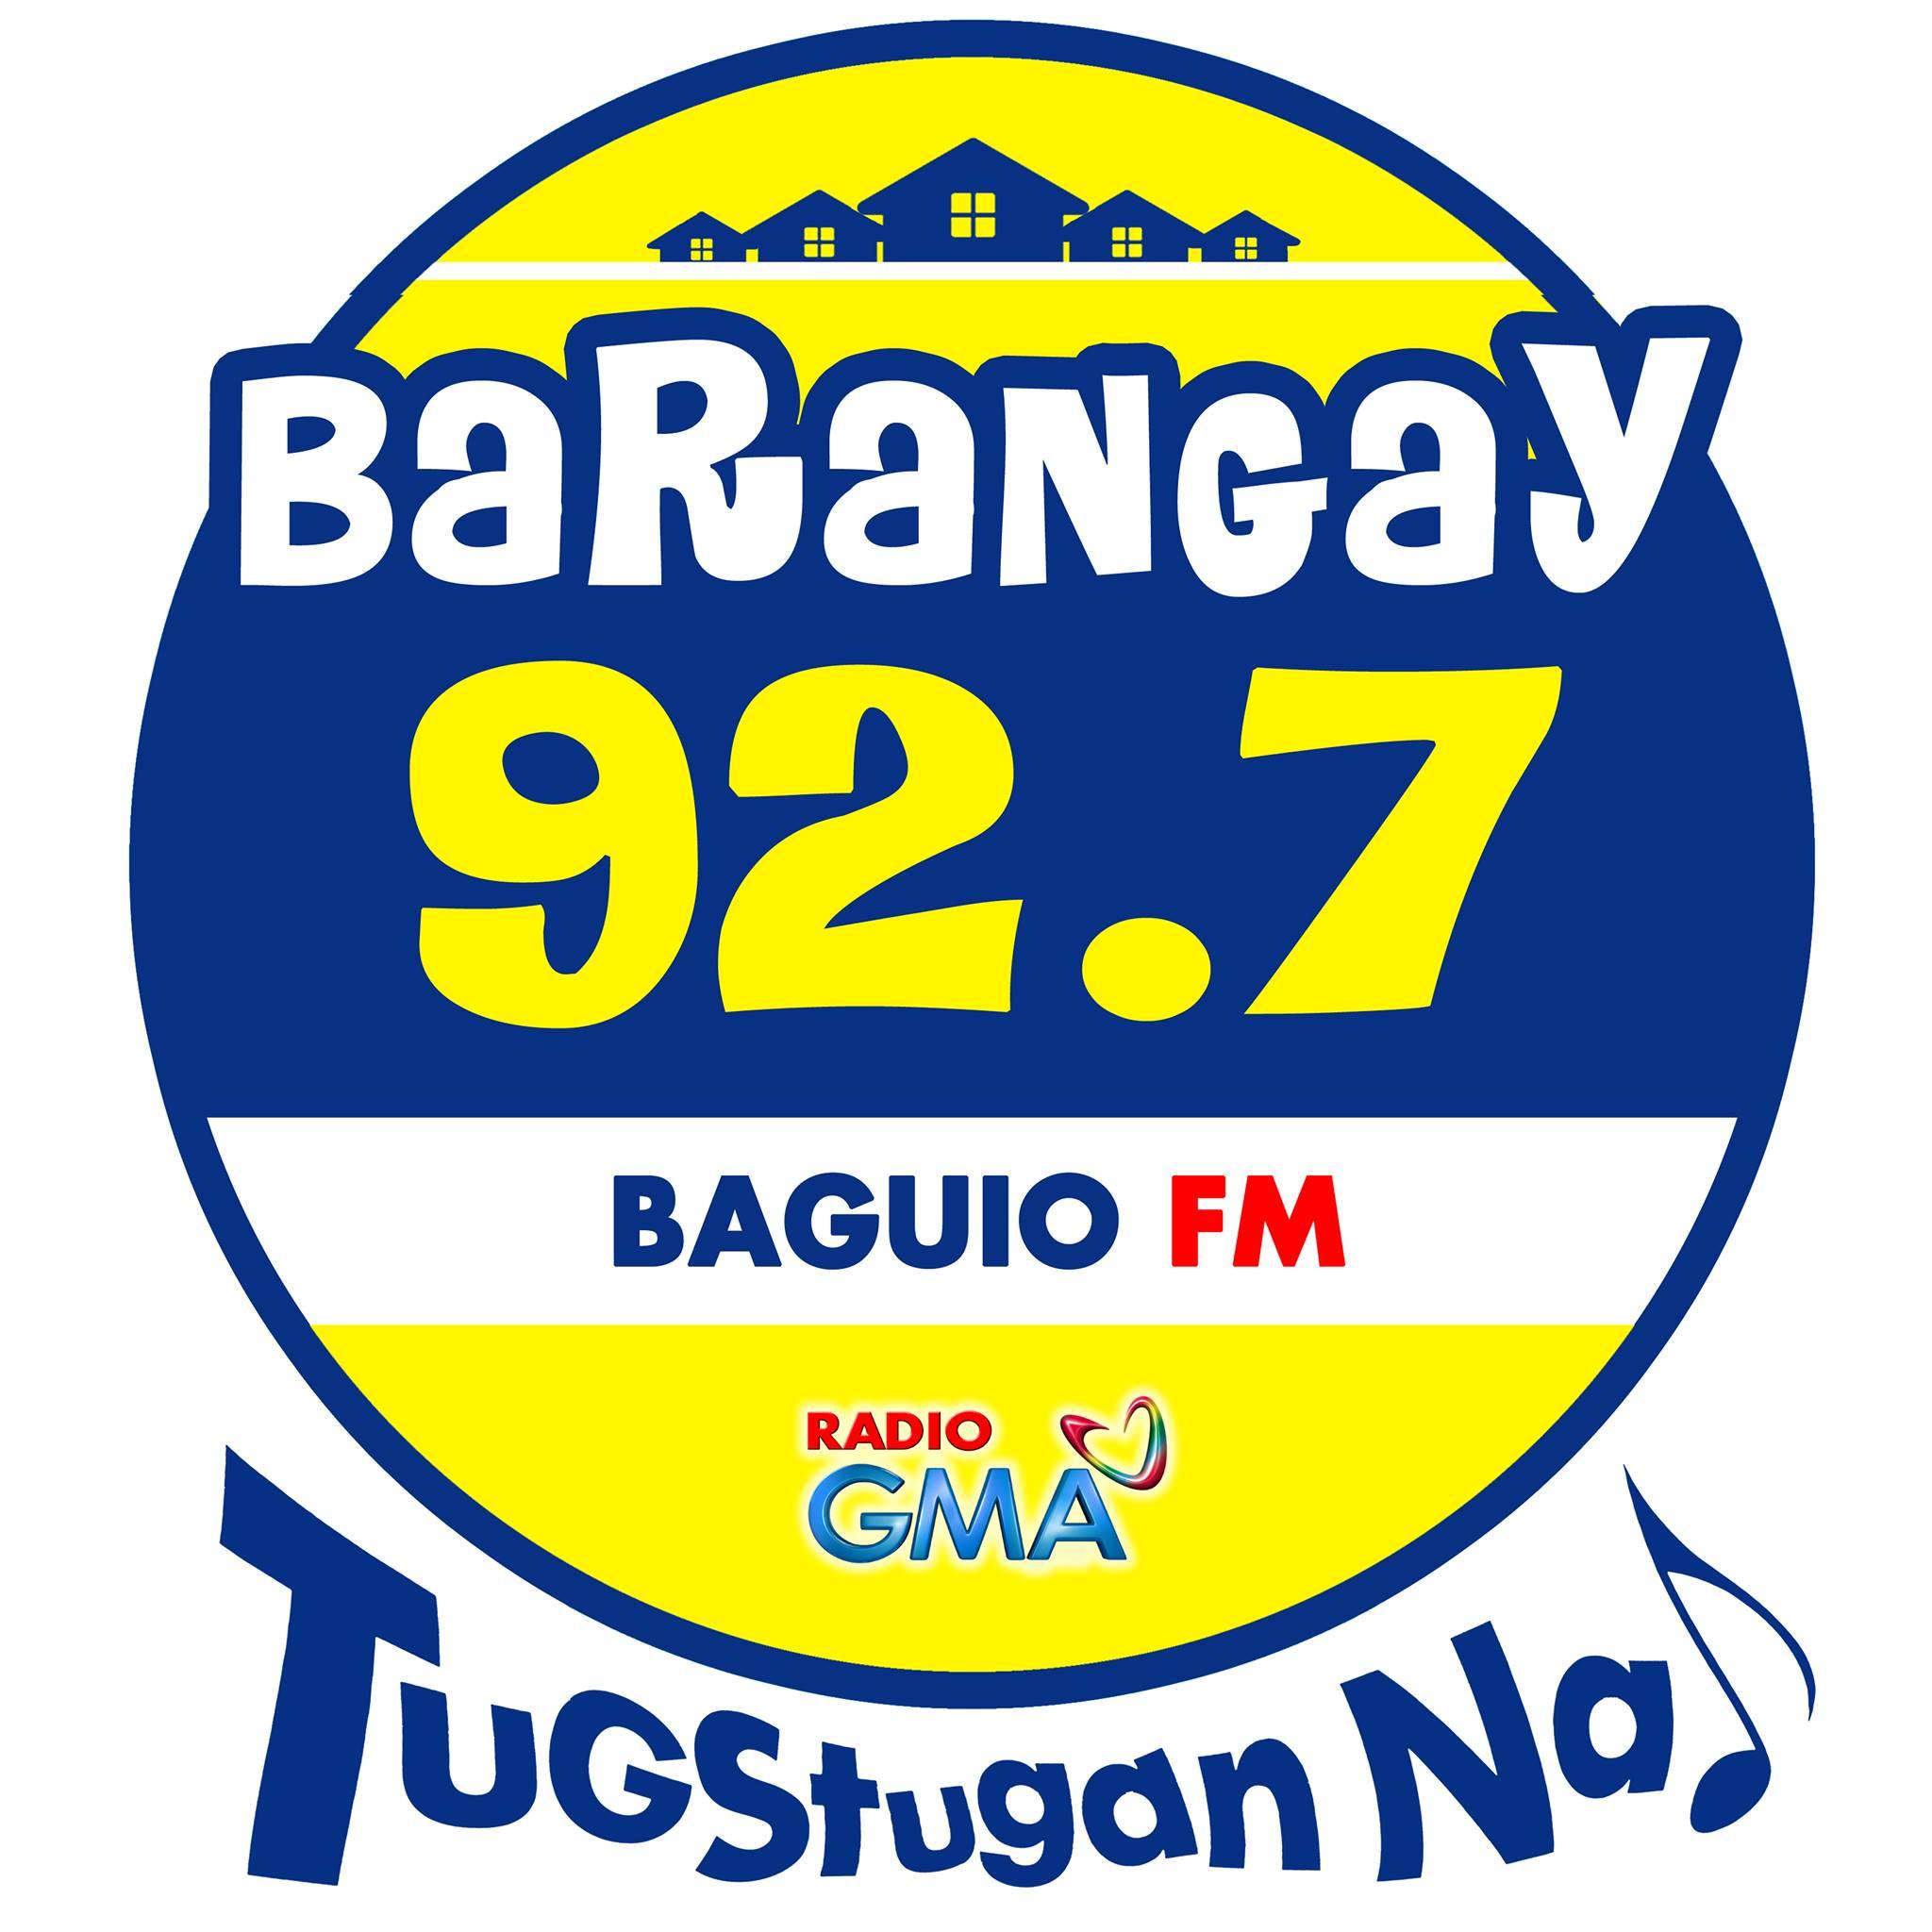 Image.barangay927baguio2015.jpeg